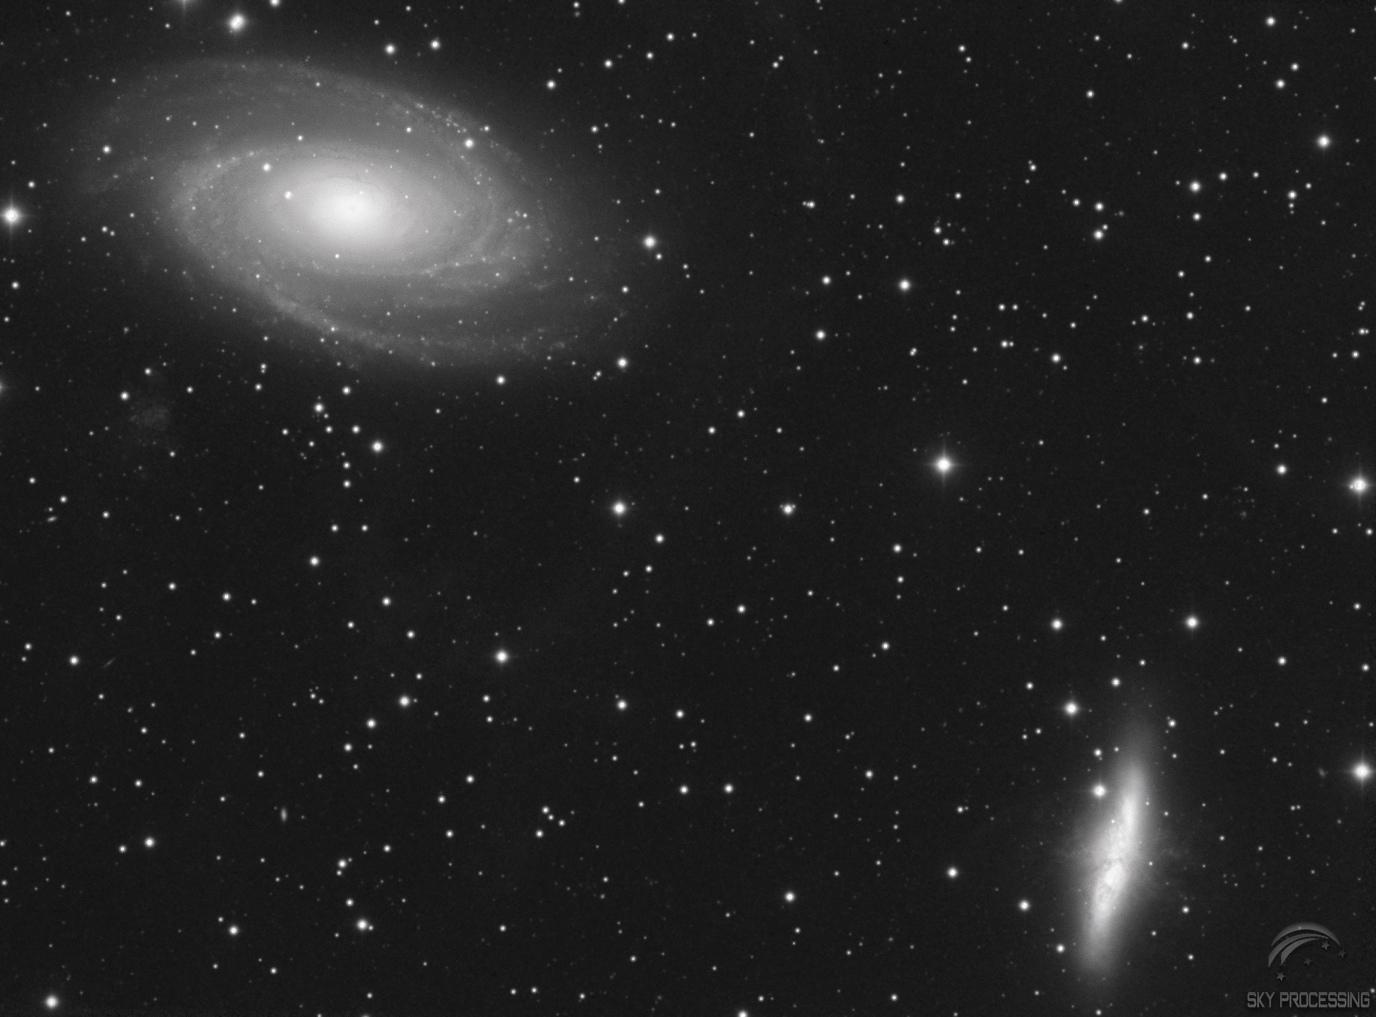 M81-82_test5_plus_sature_trouswavelet_skyprocessing_mono.jpg